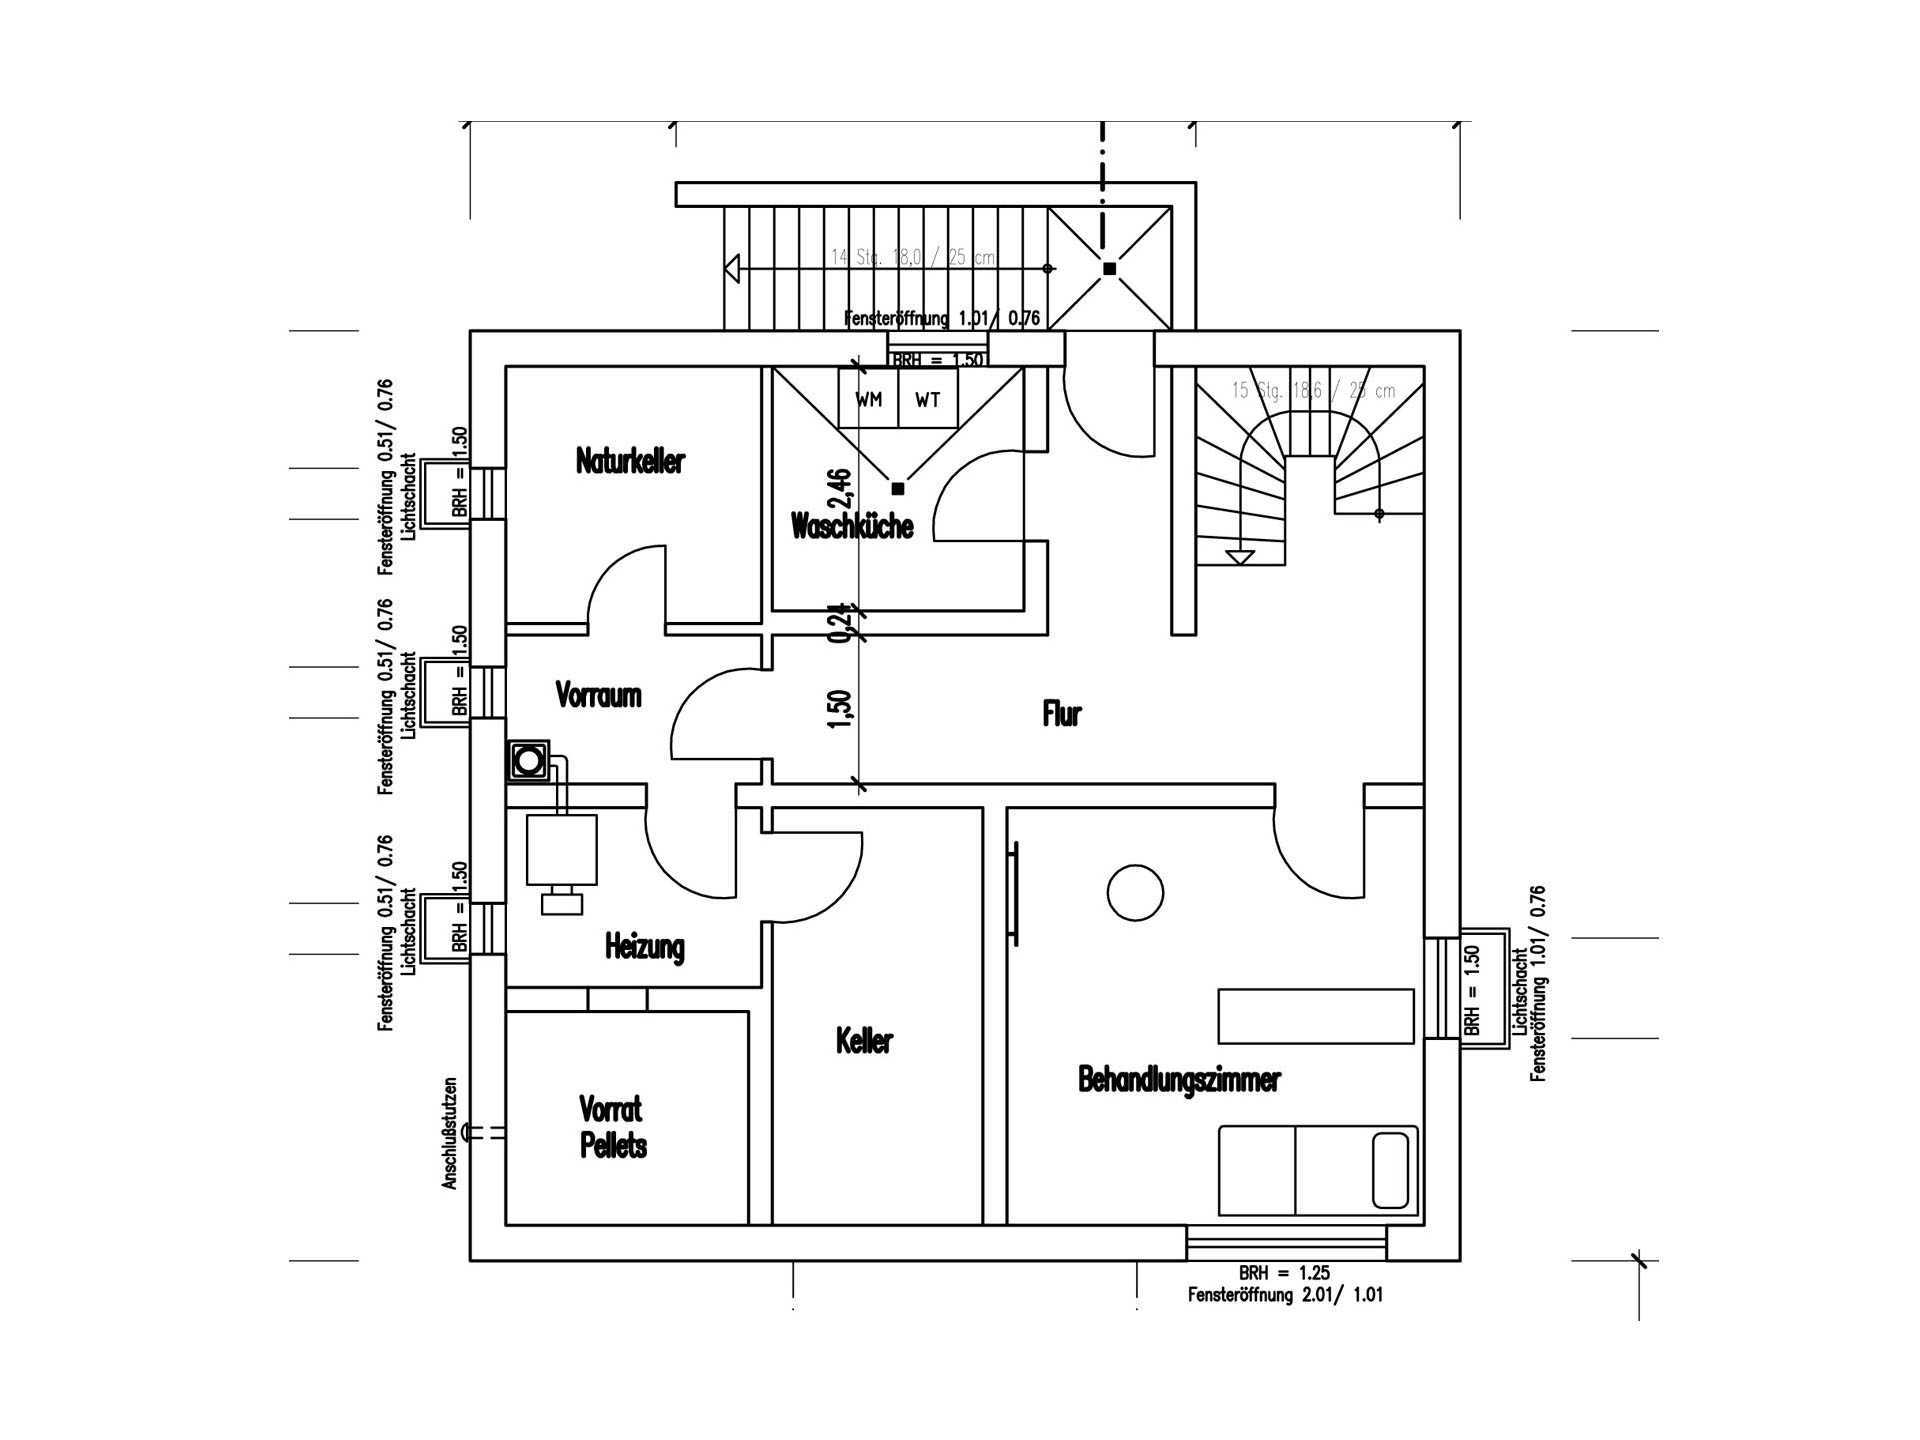 Grundriss Keller Holzhaus am Limes von Fullwod Wohnblockhaus